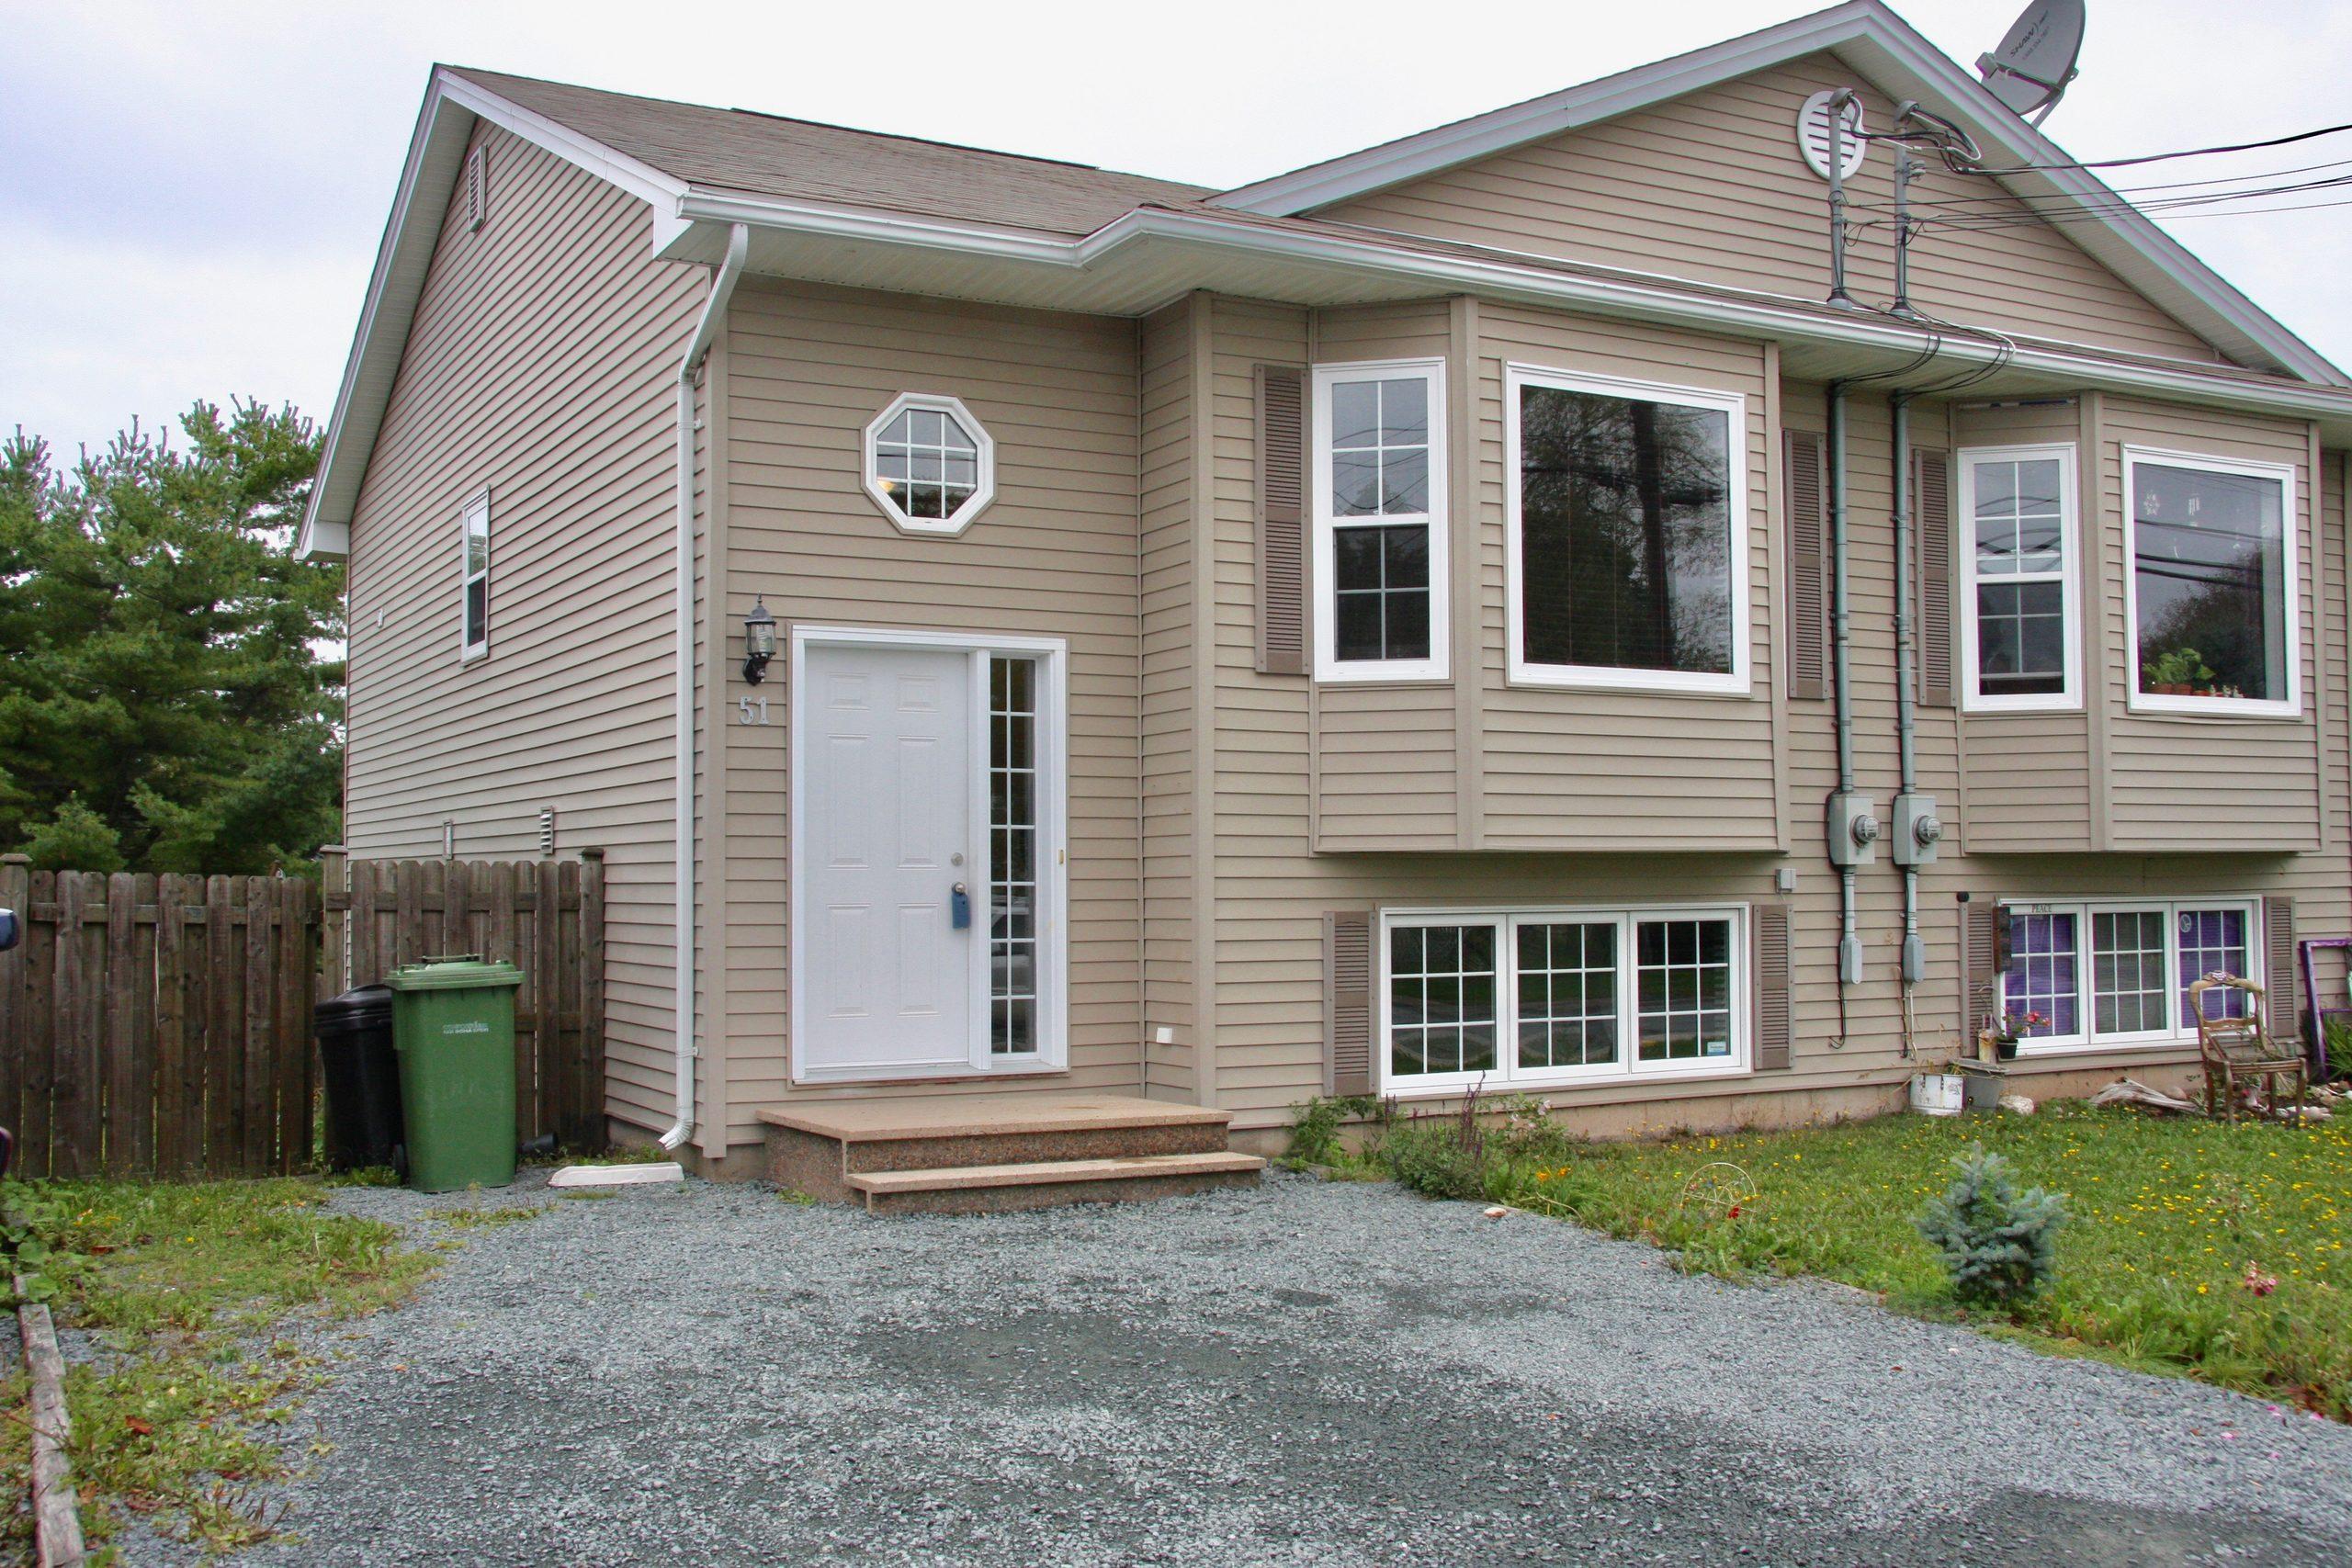 51 Everette St, Dartmouth, NS B2W 1G8